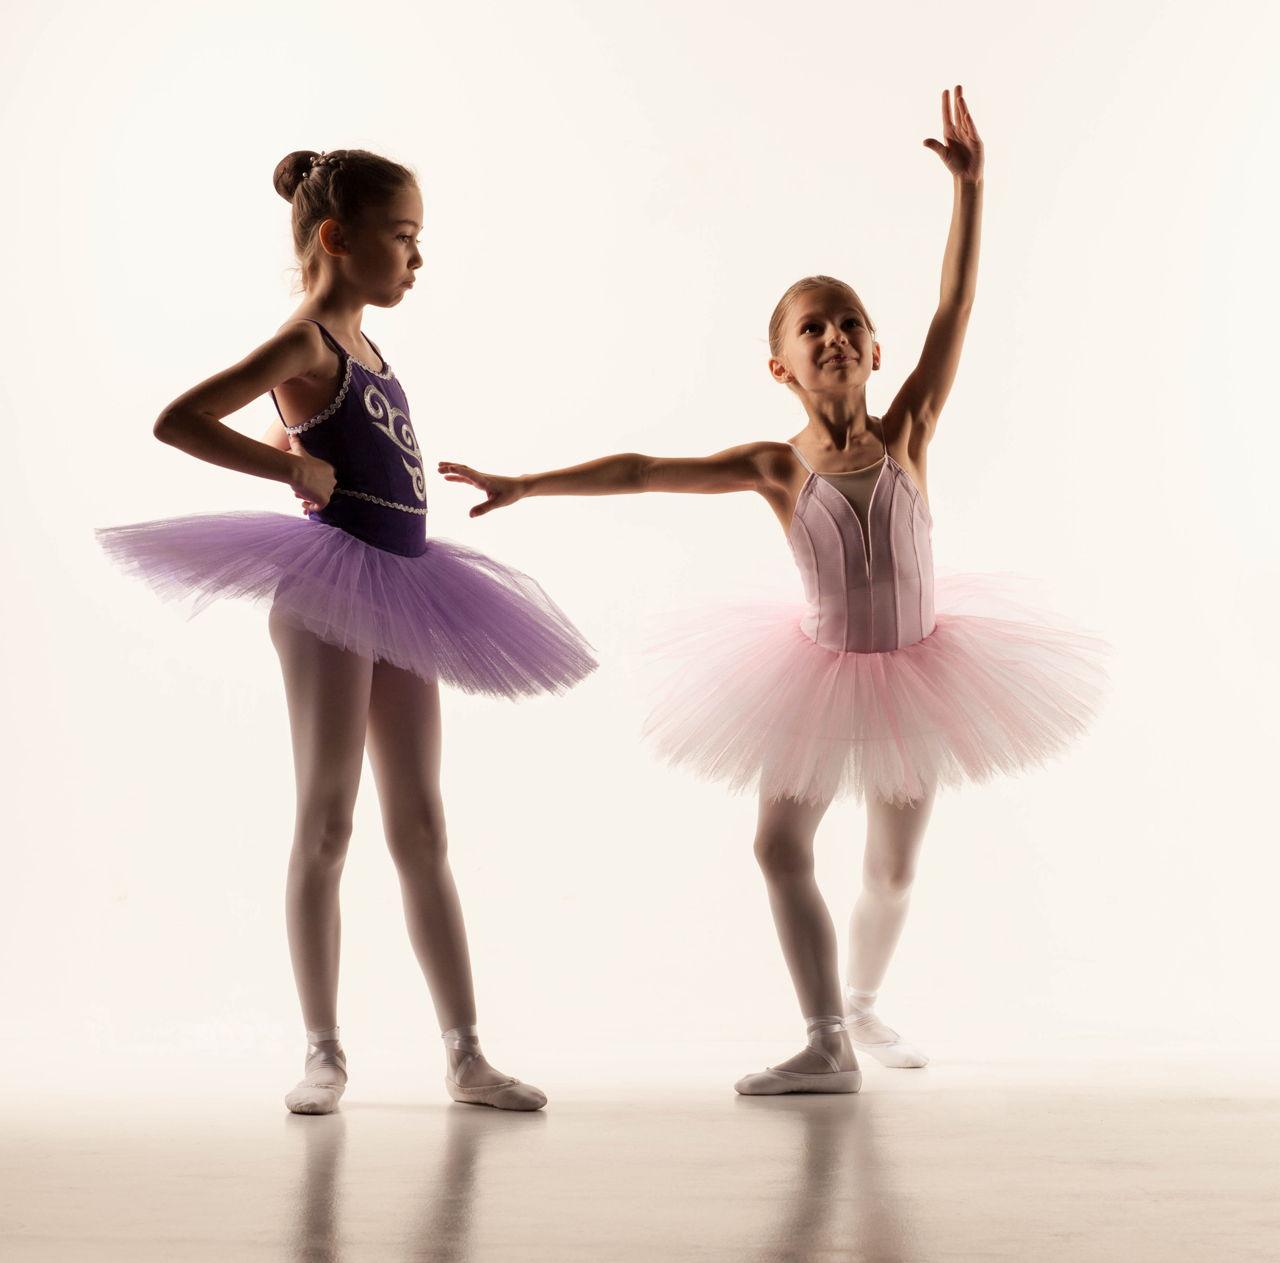 Basic Salsa Dance Steps Likewise Dancing Ballroom Dance Step Diagrams